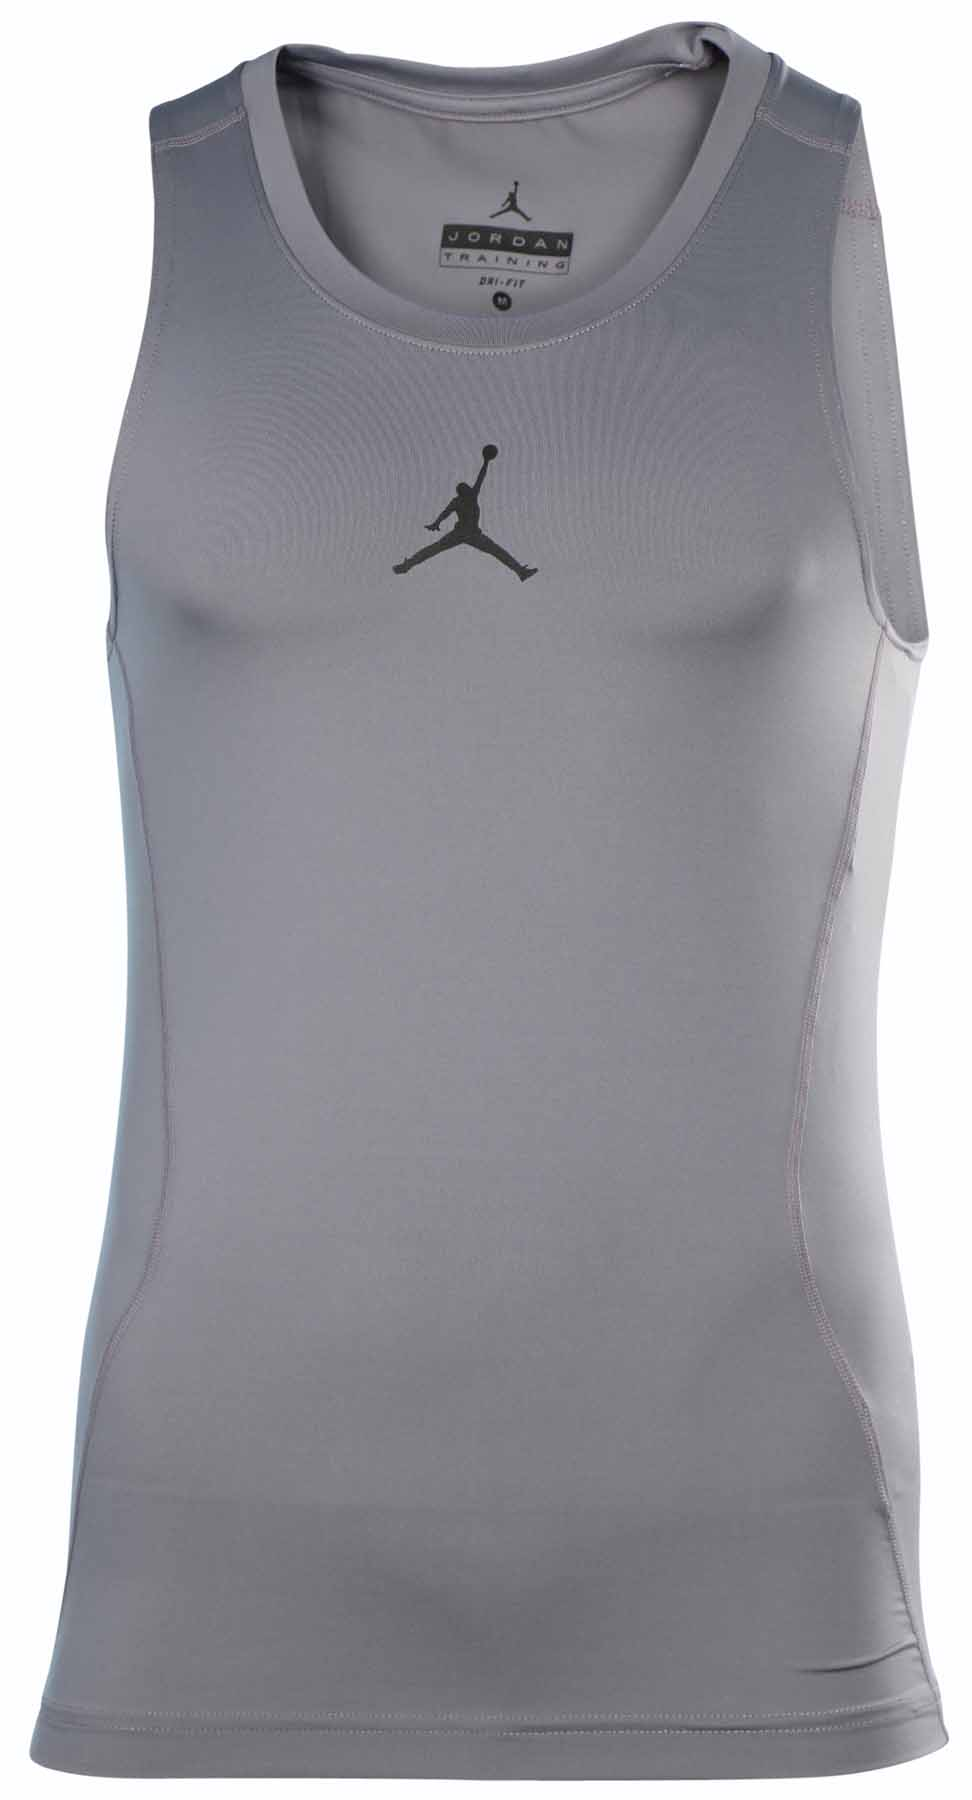 Jordan Men s Dri-Fit Nike AJ All Season Compression Tank Top  2eb5163b84727